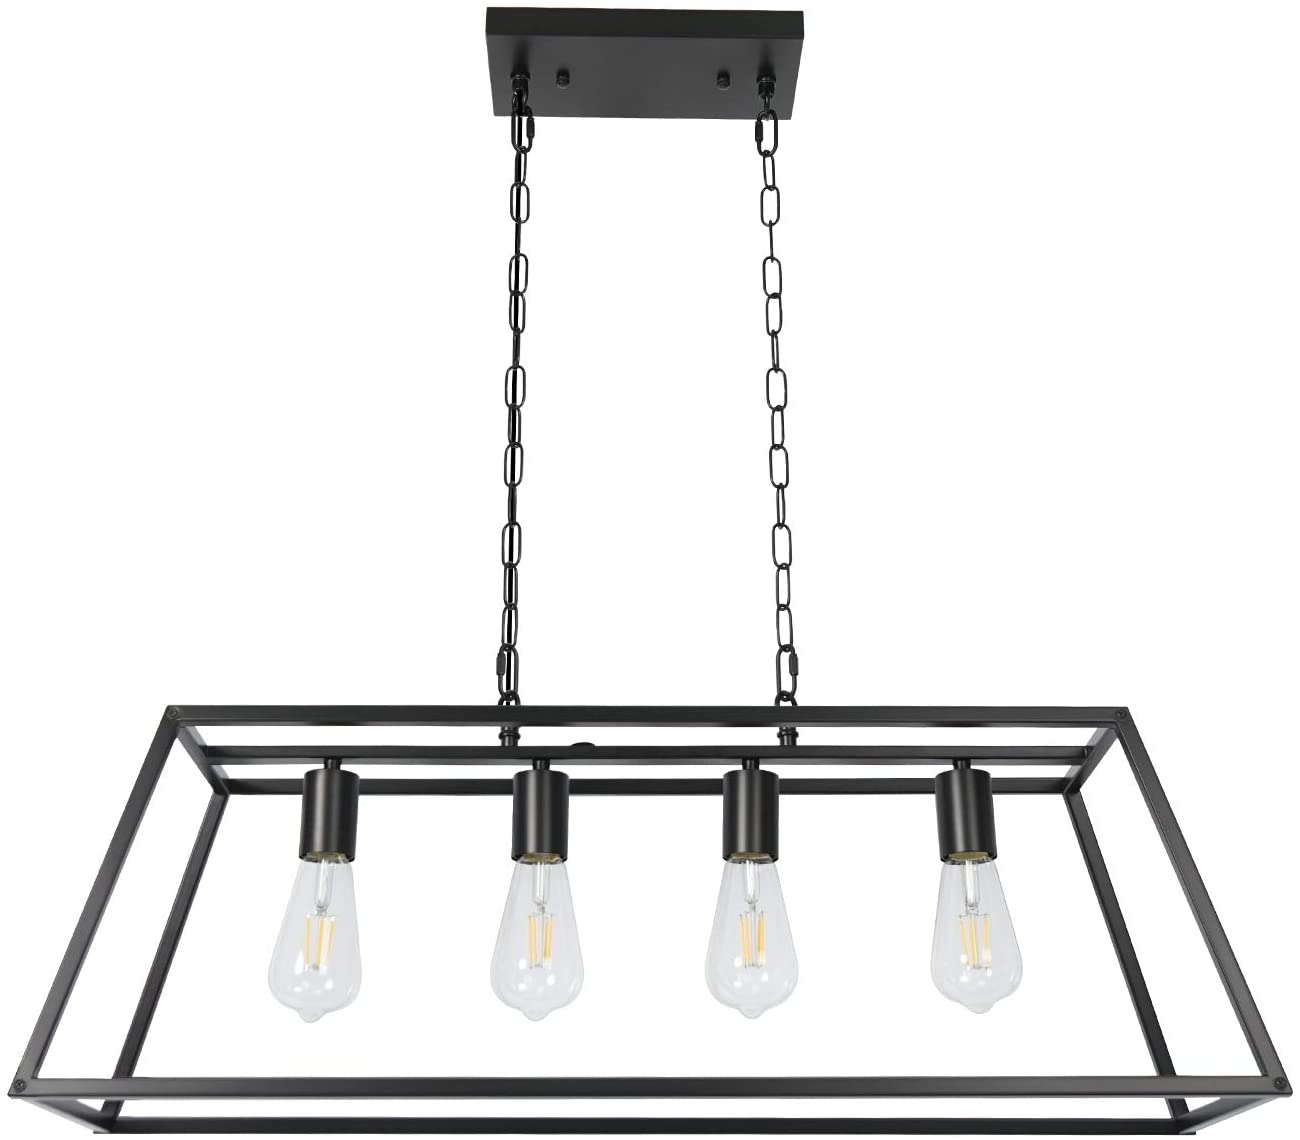 4-Light Black Industrial Farmhouse Ceiling Light for Kitchen